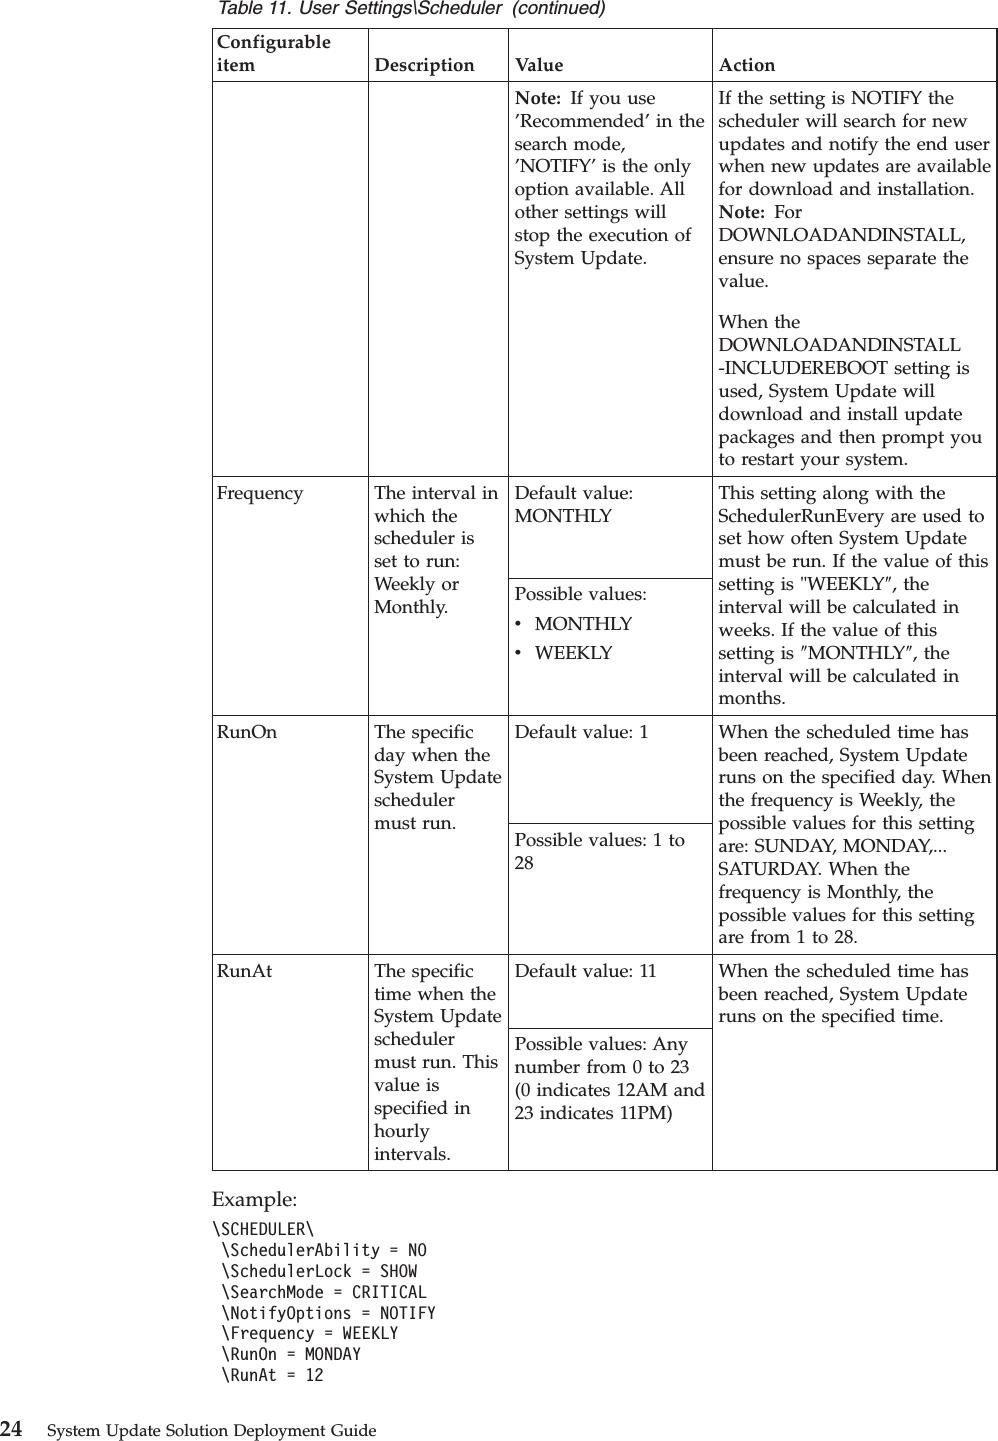 Lenovo Tvsu314 Timr1 System Update Solution Deployment Guide User